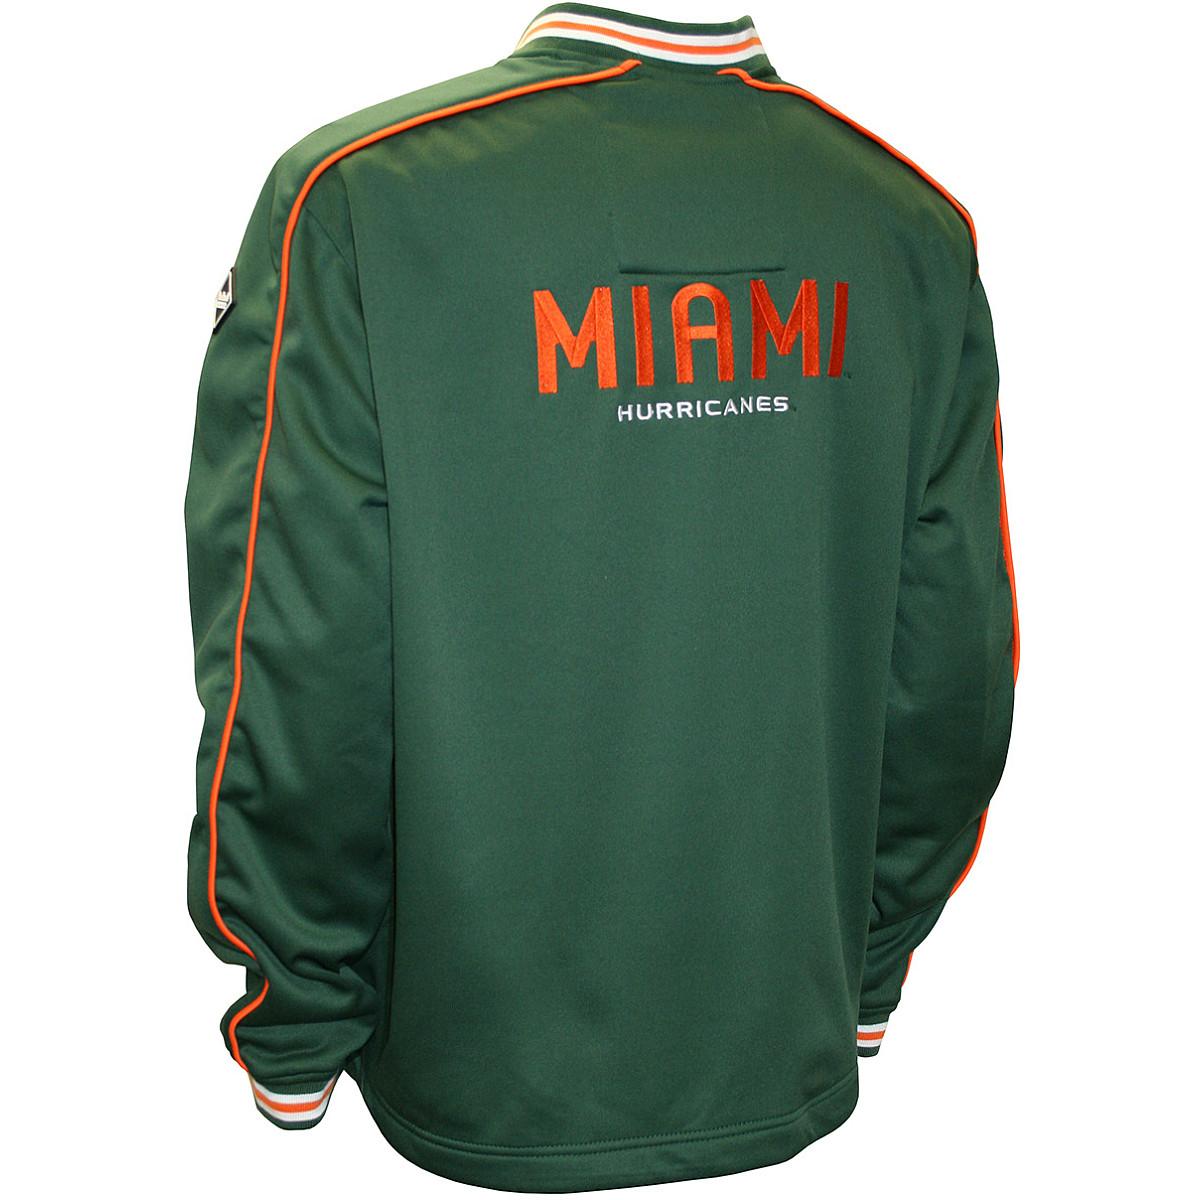 Franchise-Cub-Franchise-Club-Miami-Hurricanes-Edge-Fleece-Pullover-Jacket thumbnail 4